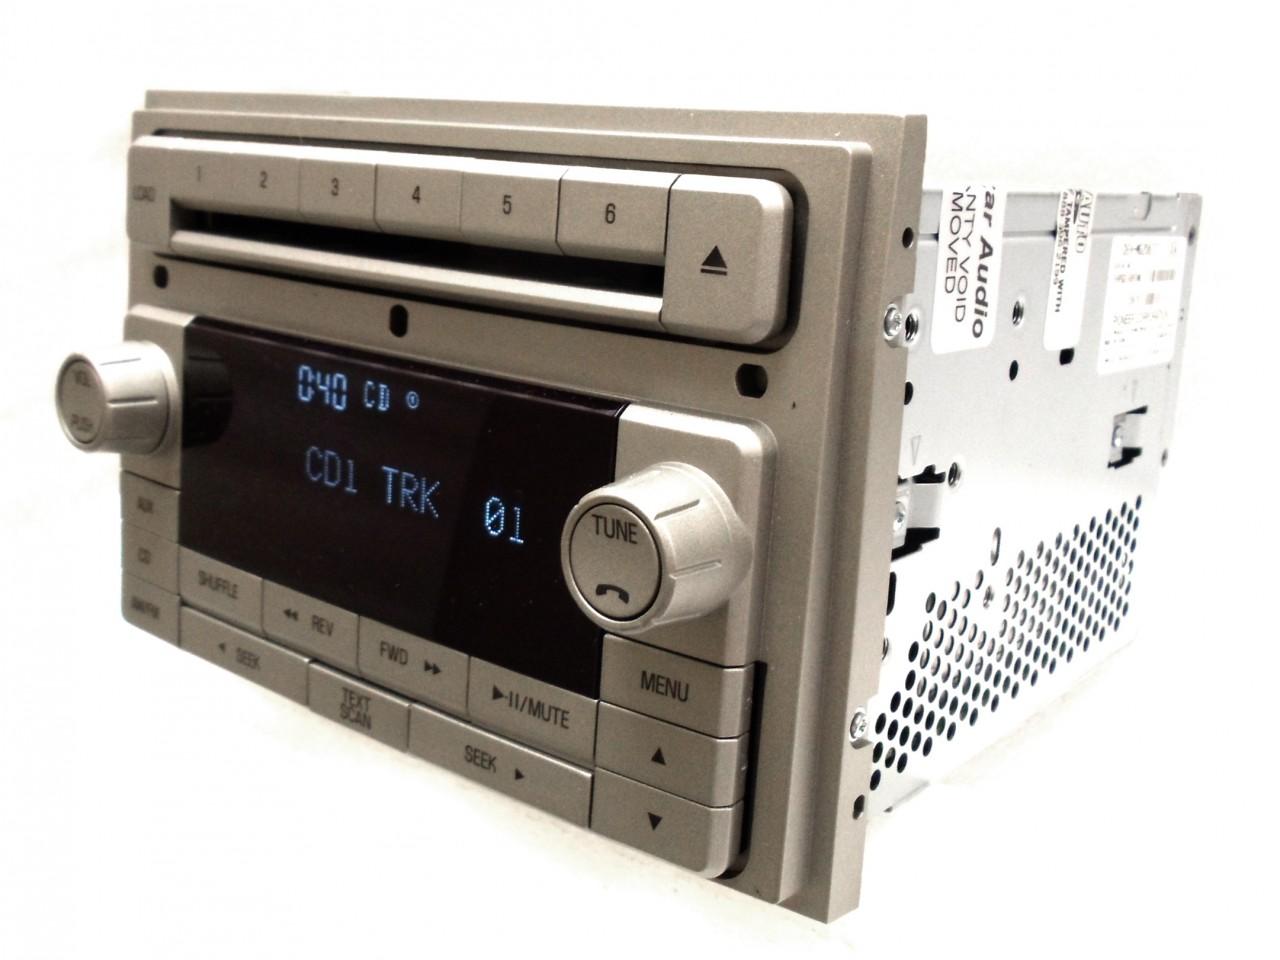 service manual removing radio 2006 lincoln zephyr 2006. Black Bedroom Furniture Sets. Home Design Ideas